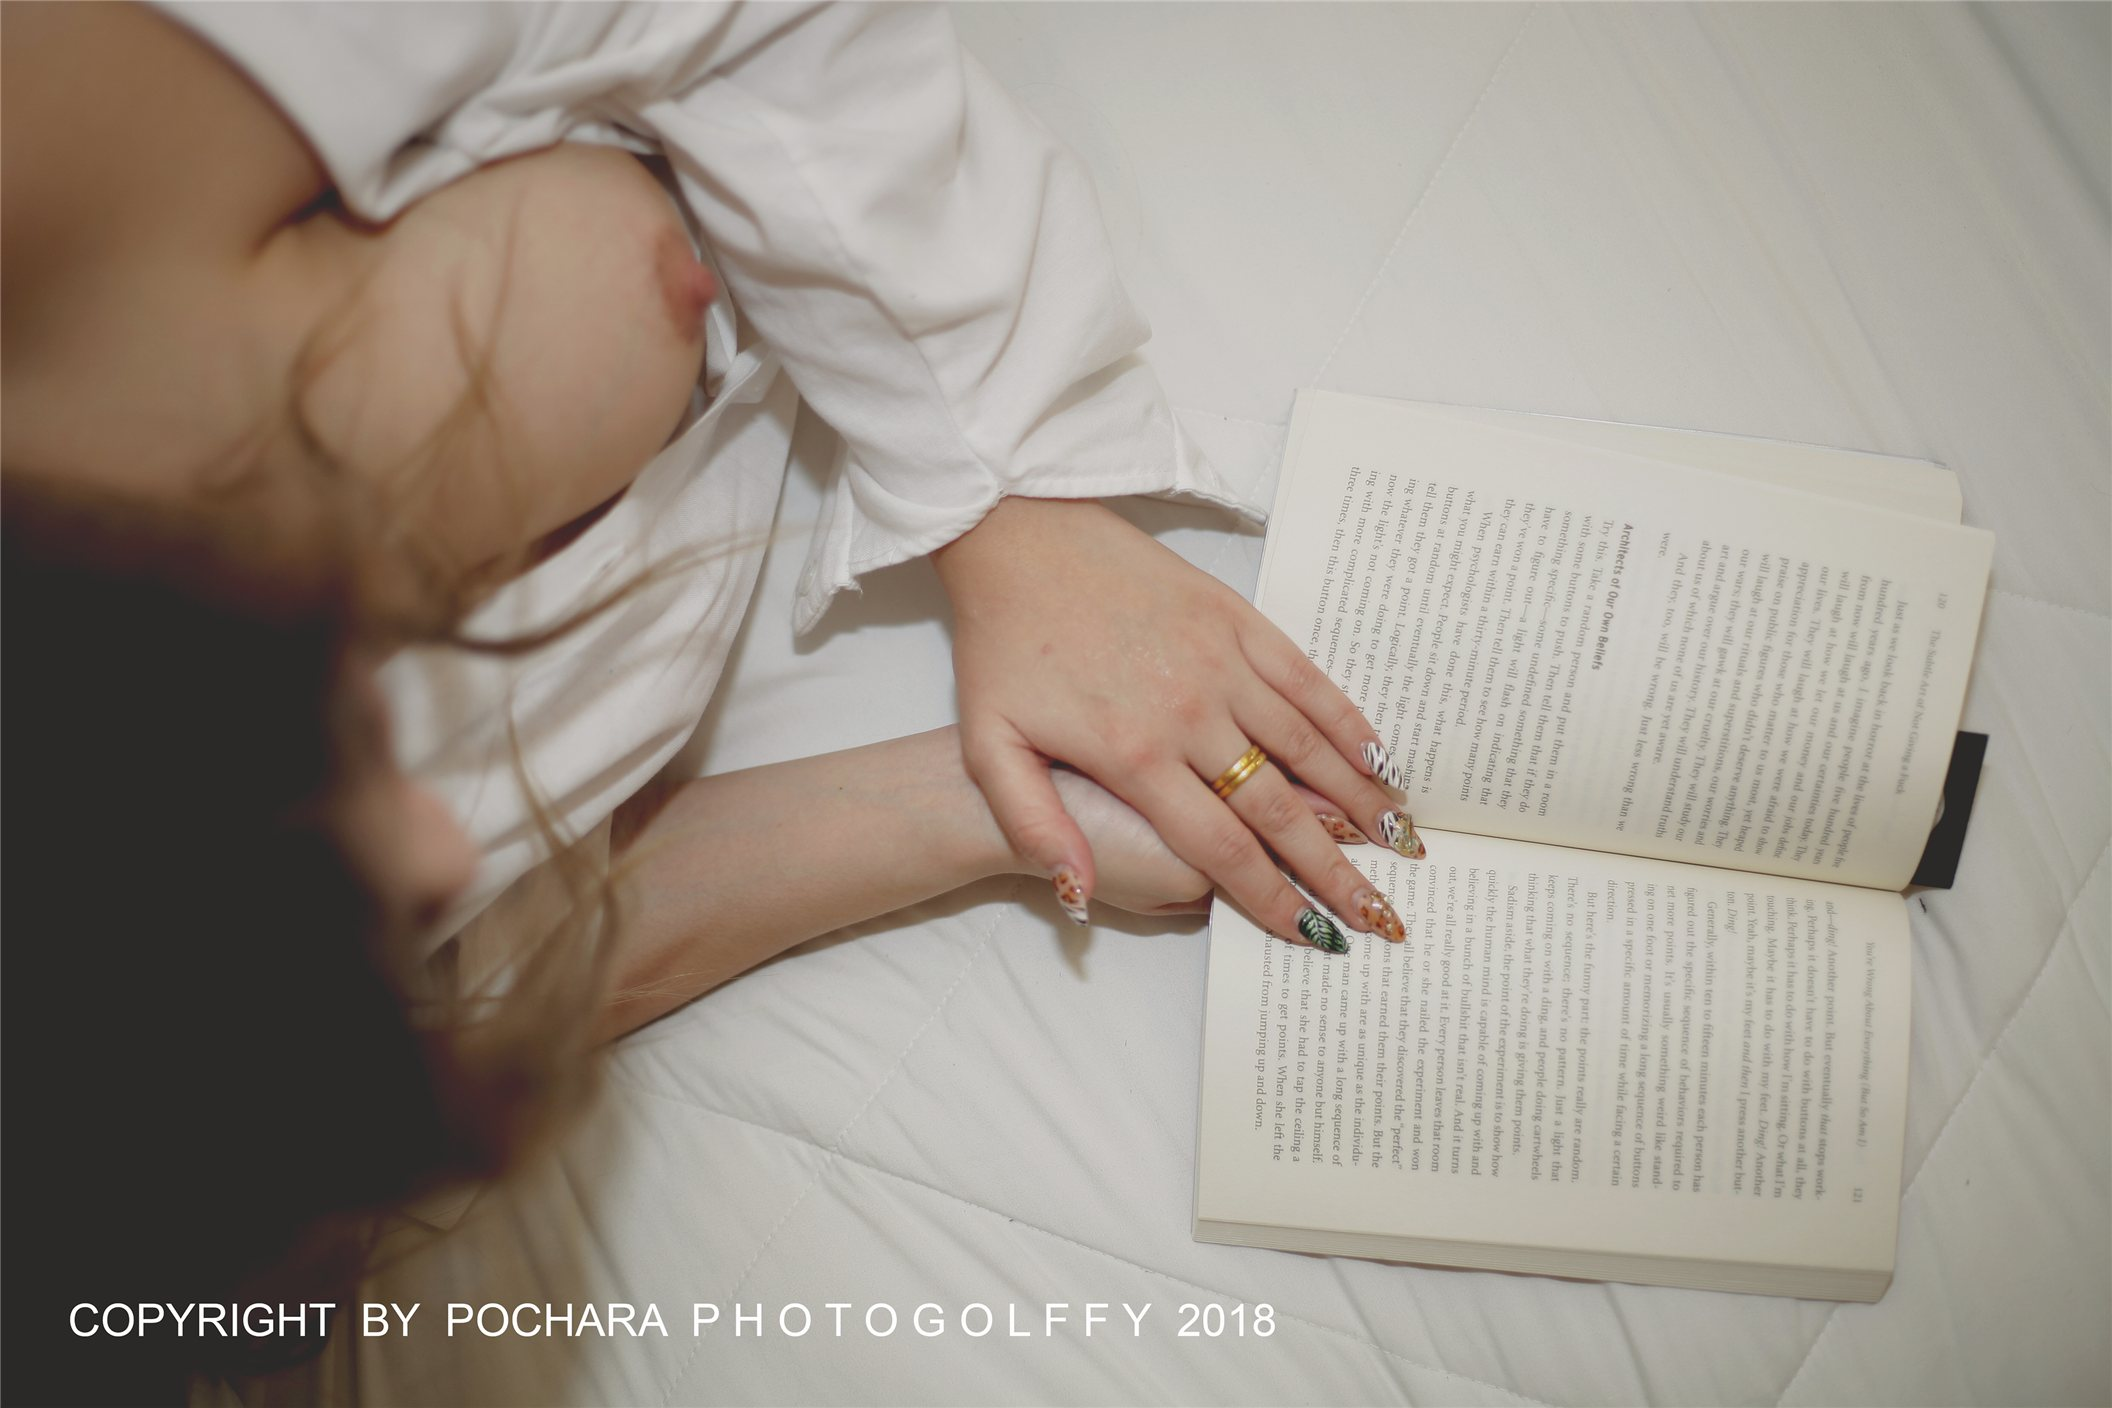 Jenny Hottie by Pochara Photogolffy